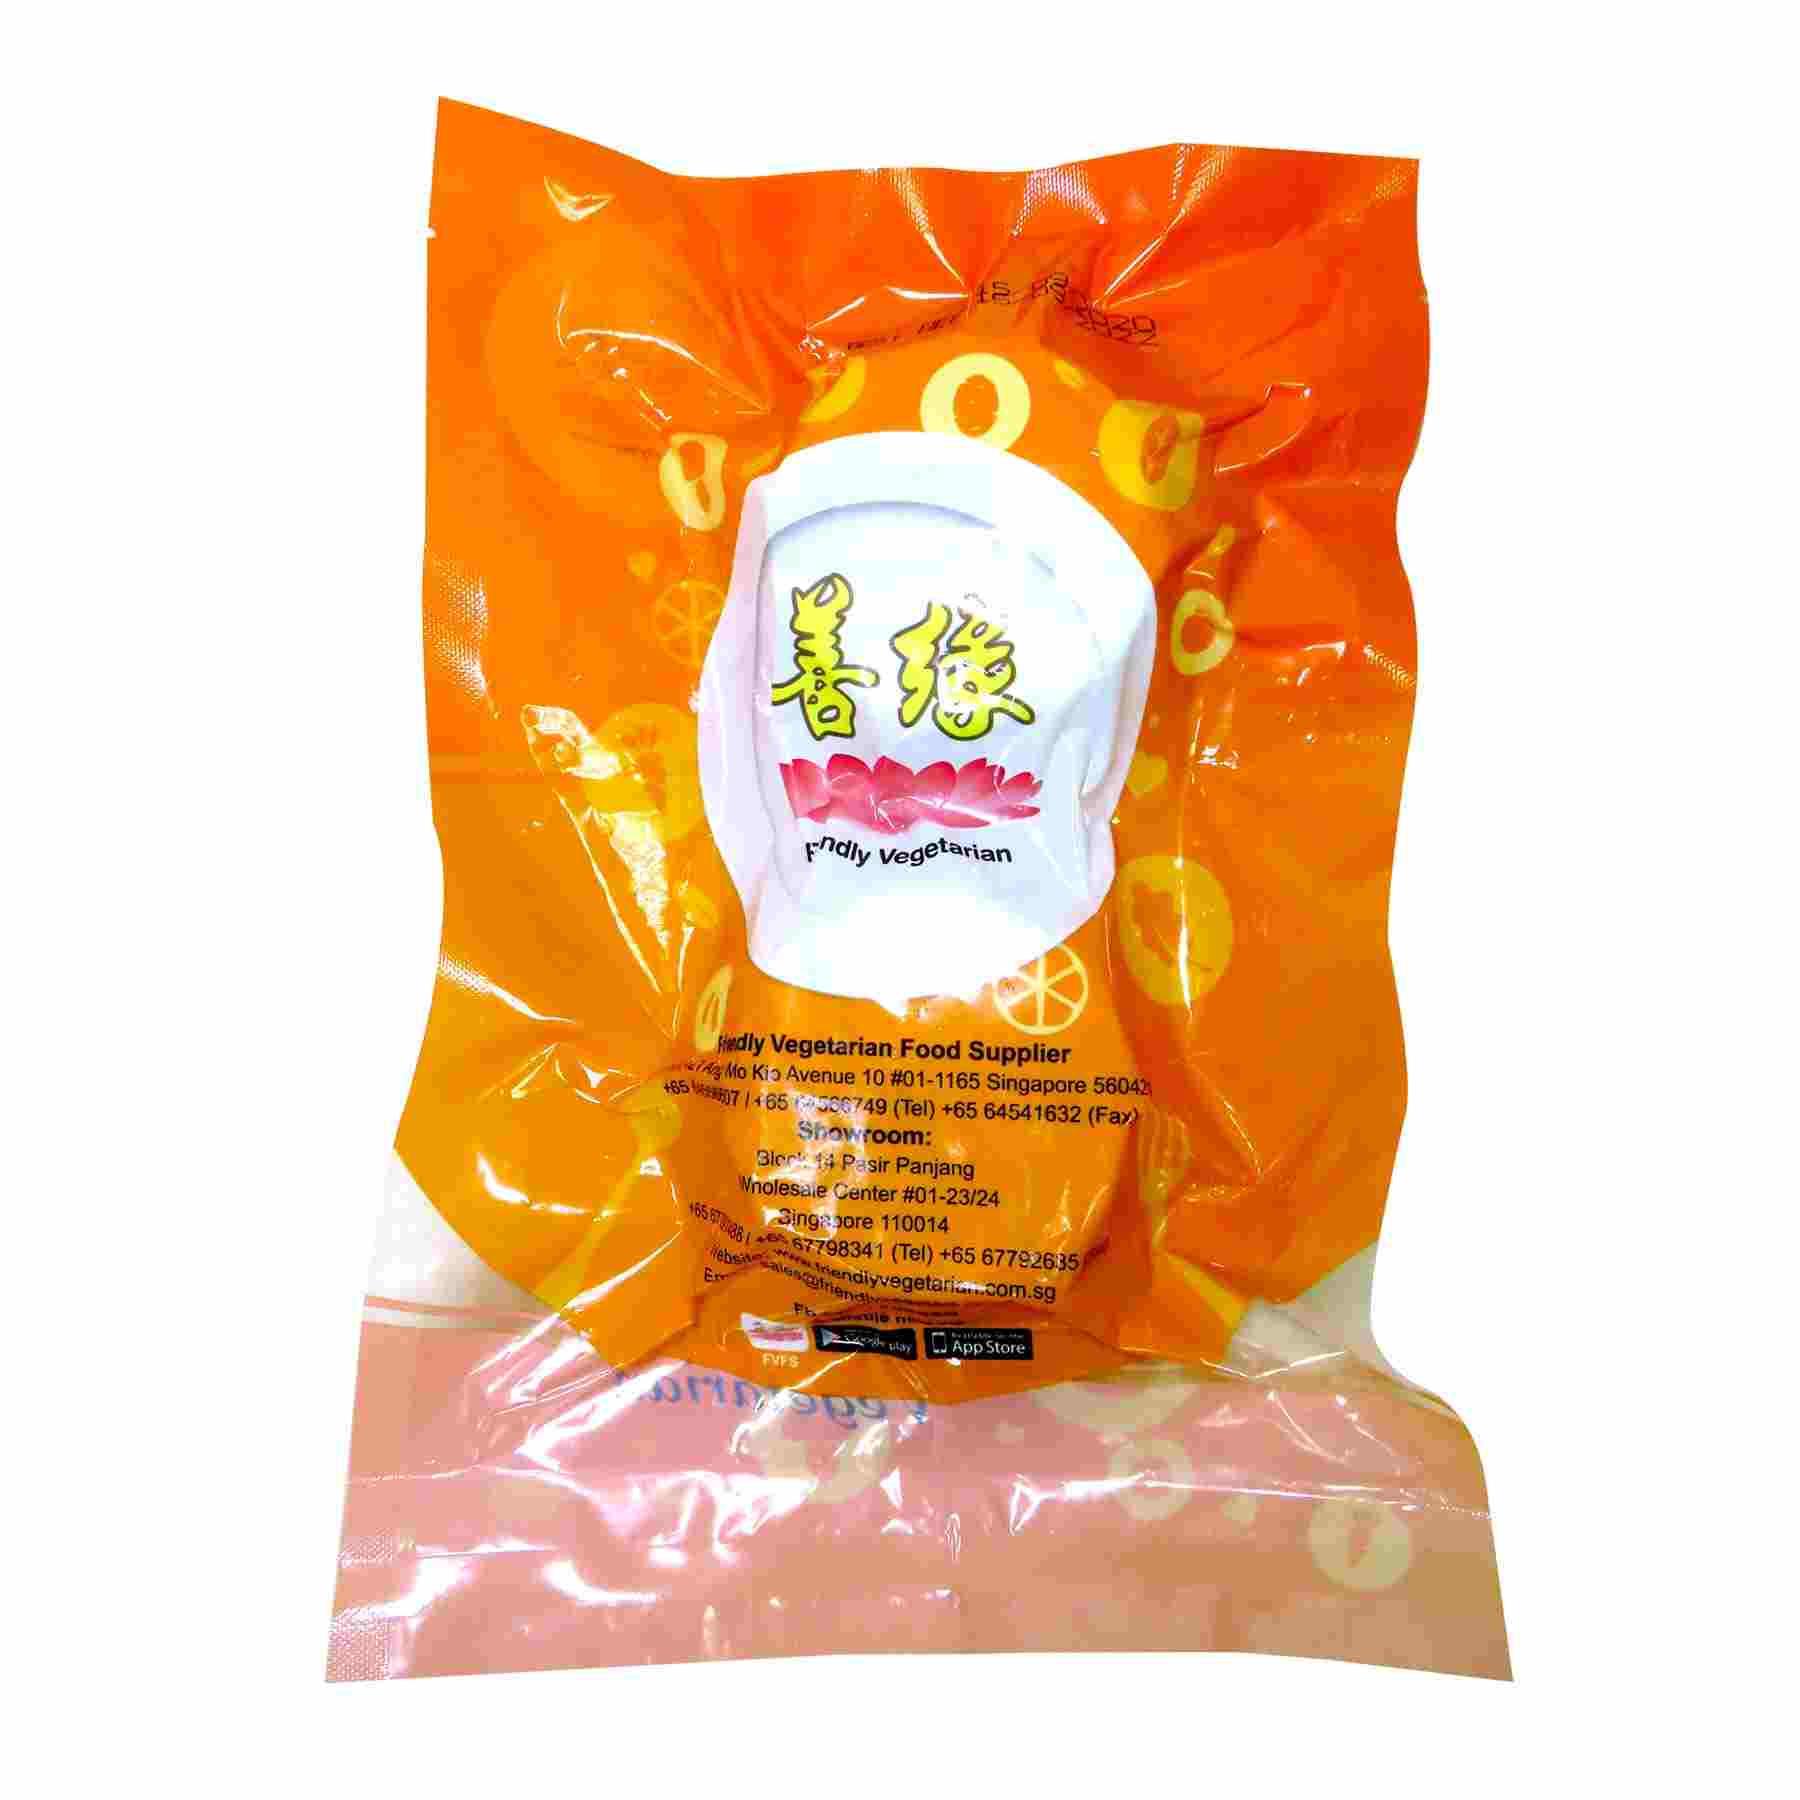 Image Friendly FV Foods Hericium Glutinous Rice 善缘猴头菇糯米鸡 2 pieces